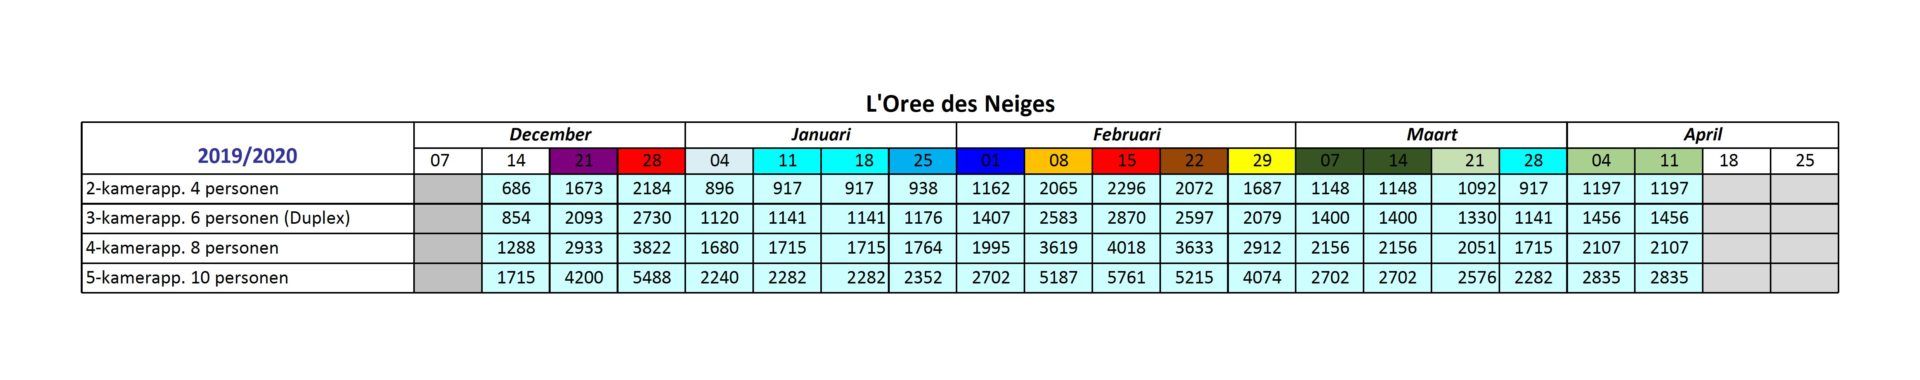 CGH L'Oree des Neiges prijstabel 2019 2020